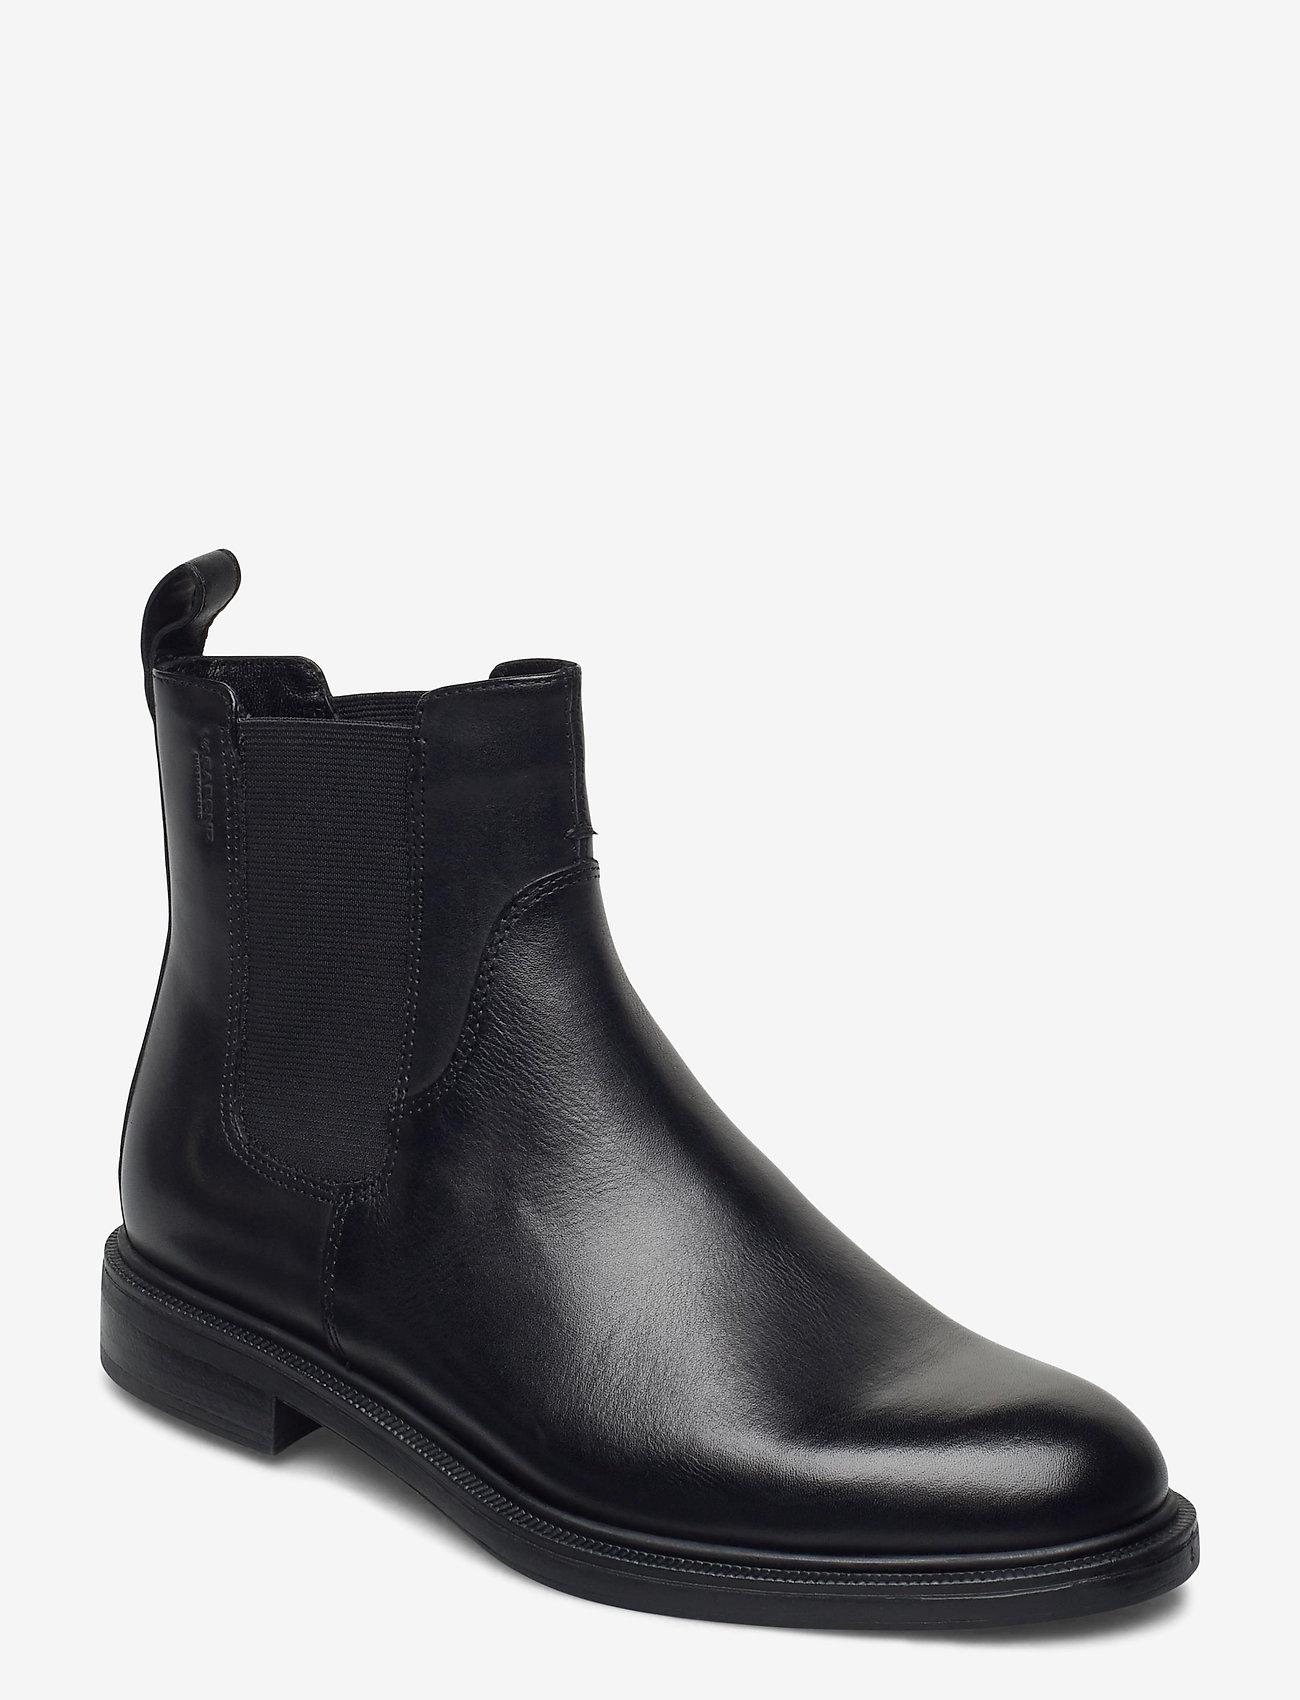 VAGABOND - AMINA - chelsea boots - black - 0